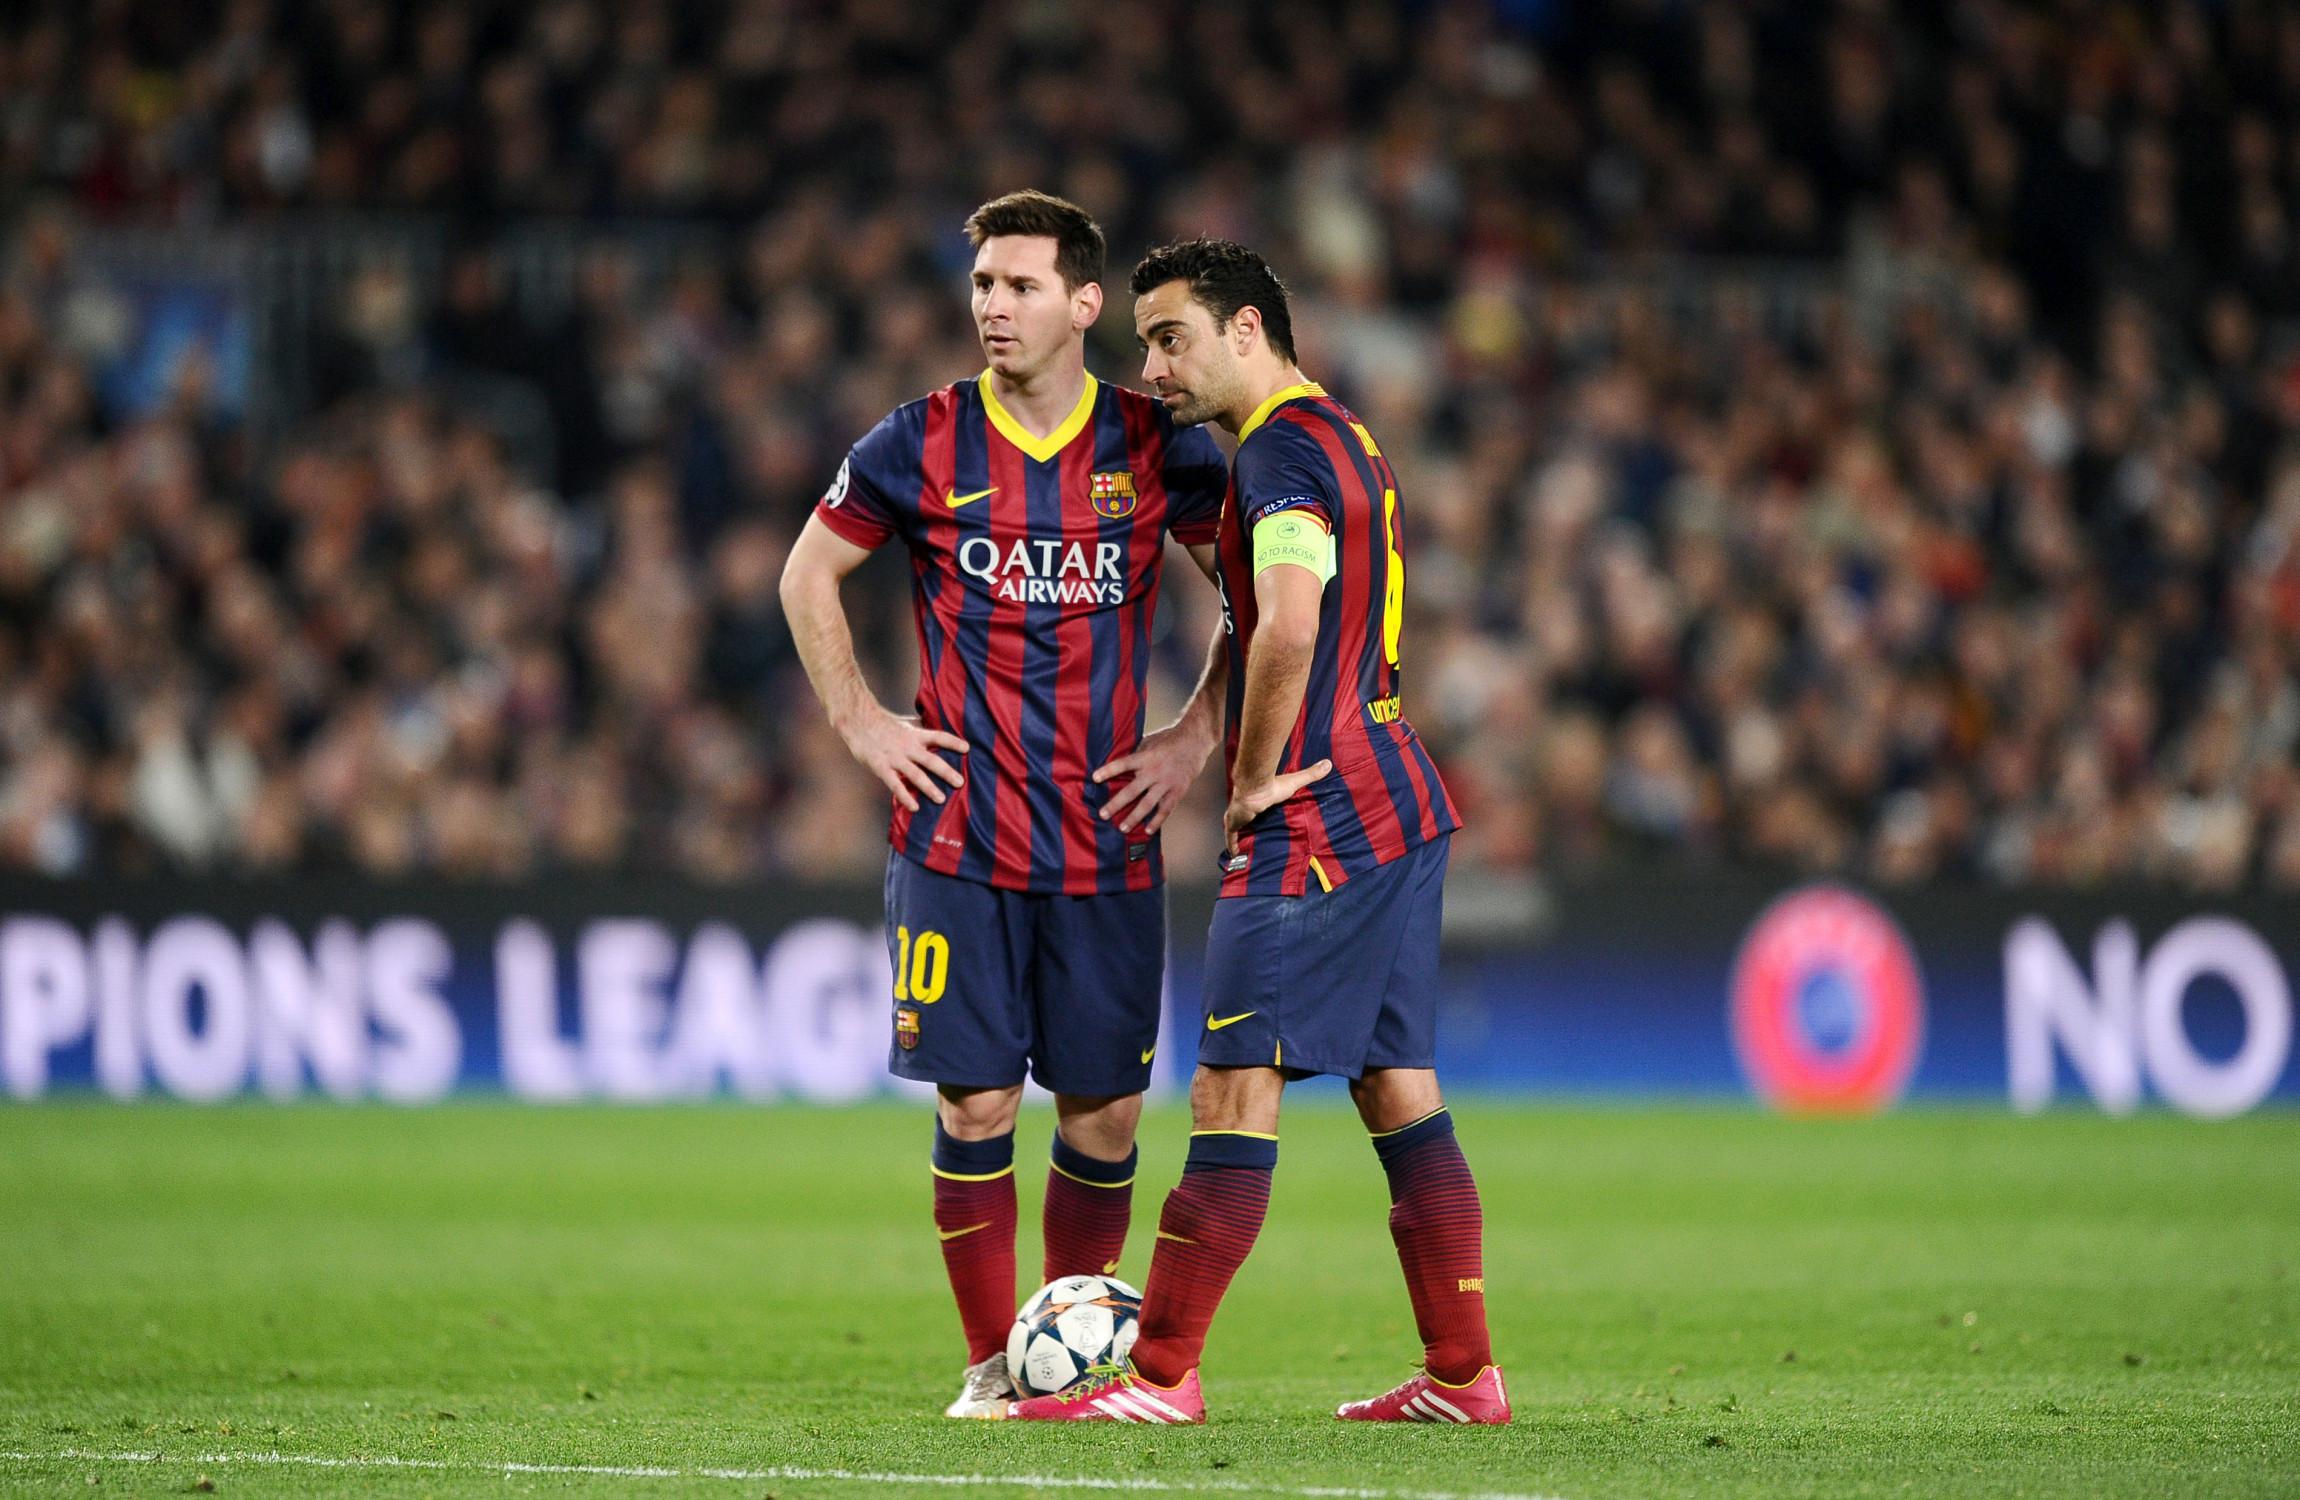 Xavi I got the feeling that Messi and Mascherano did not enjoy